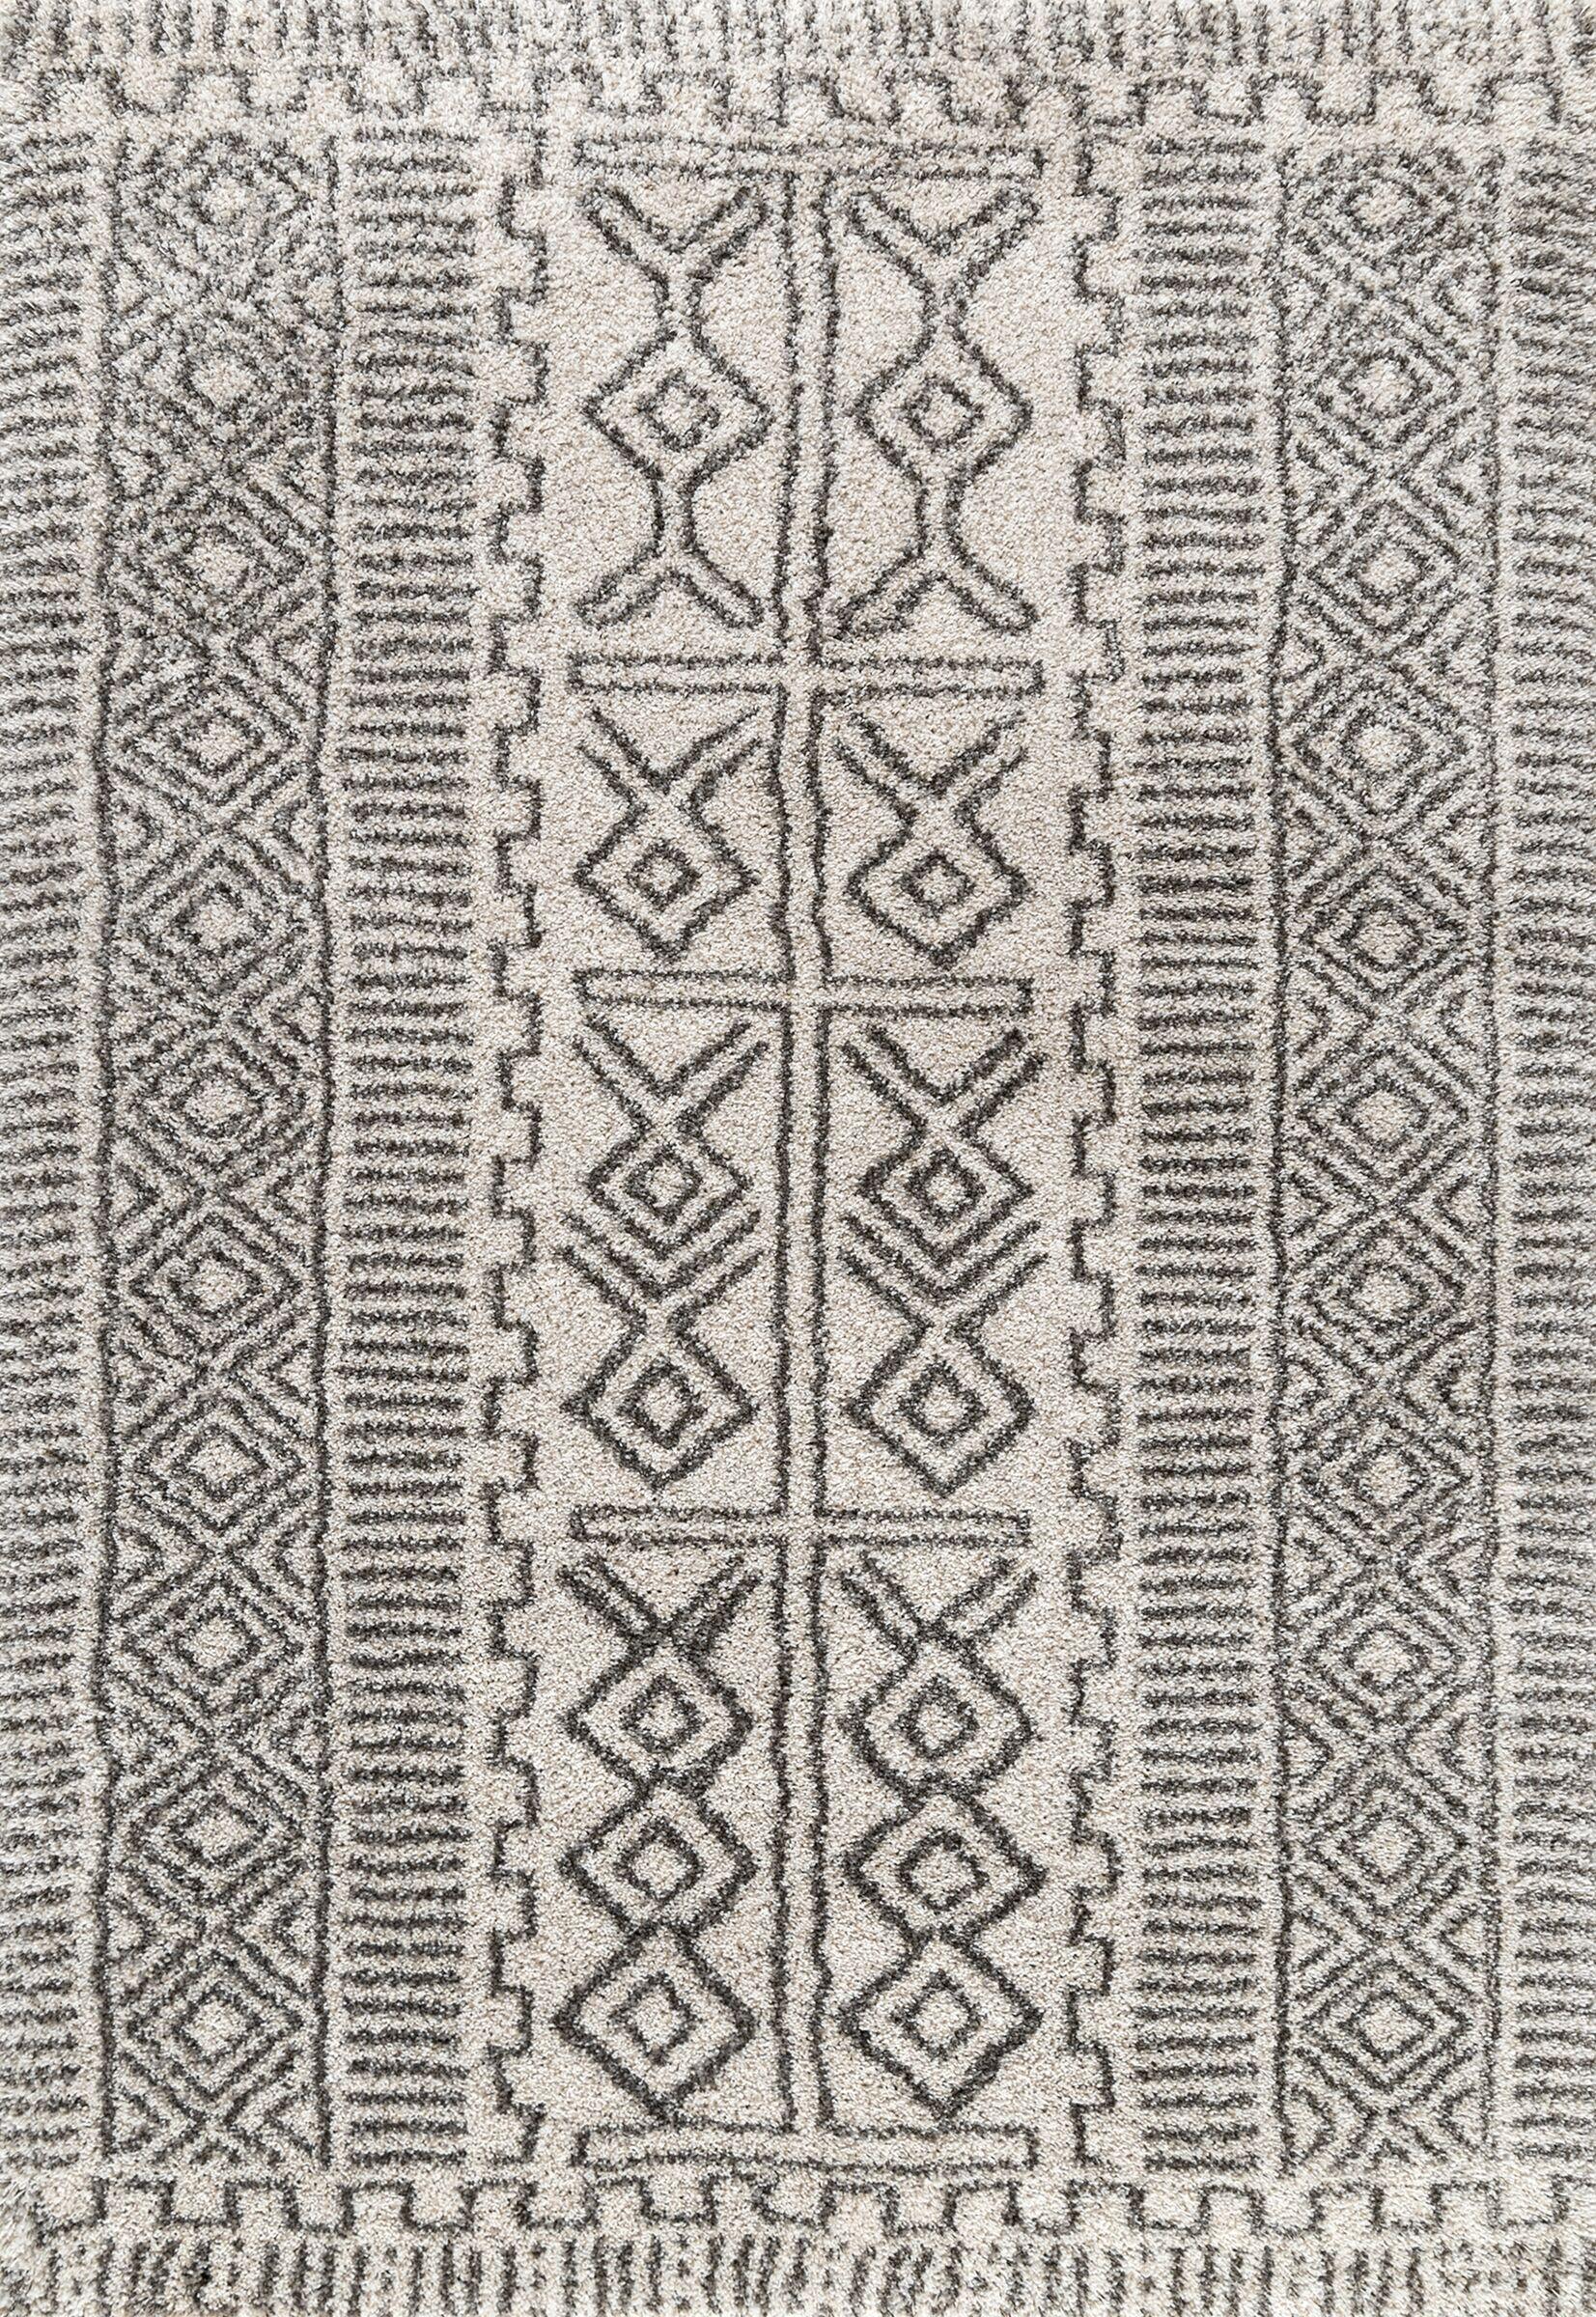 Steele Ivory Area Rug Rug Size: Rectangle 5' x 8'